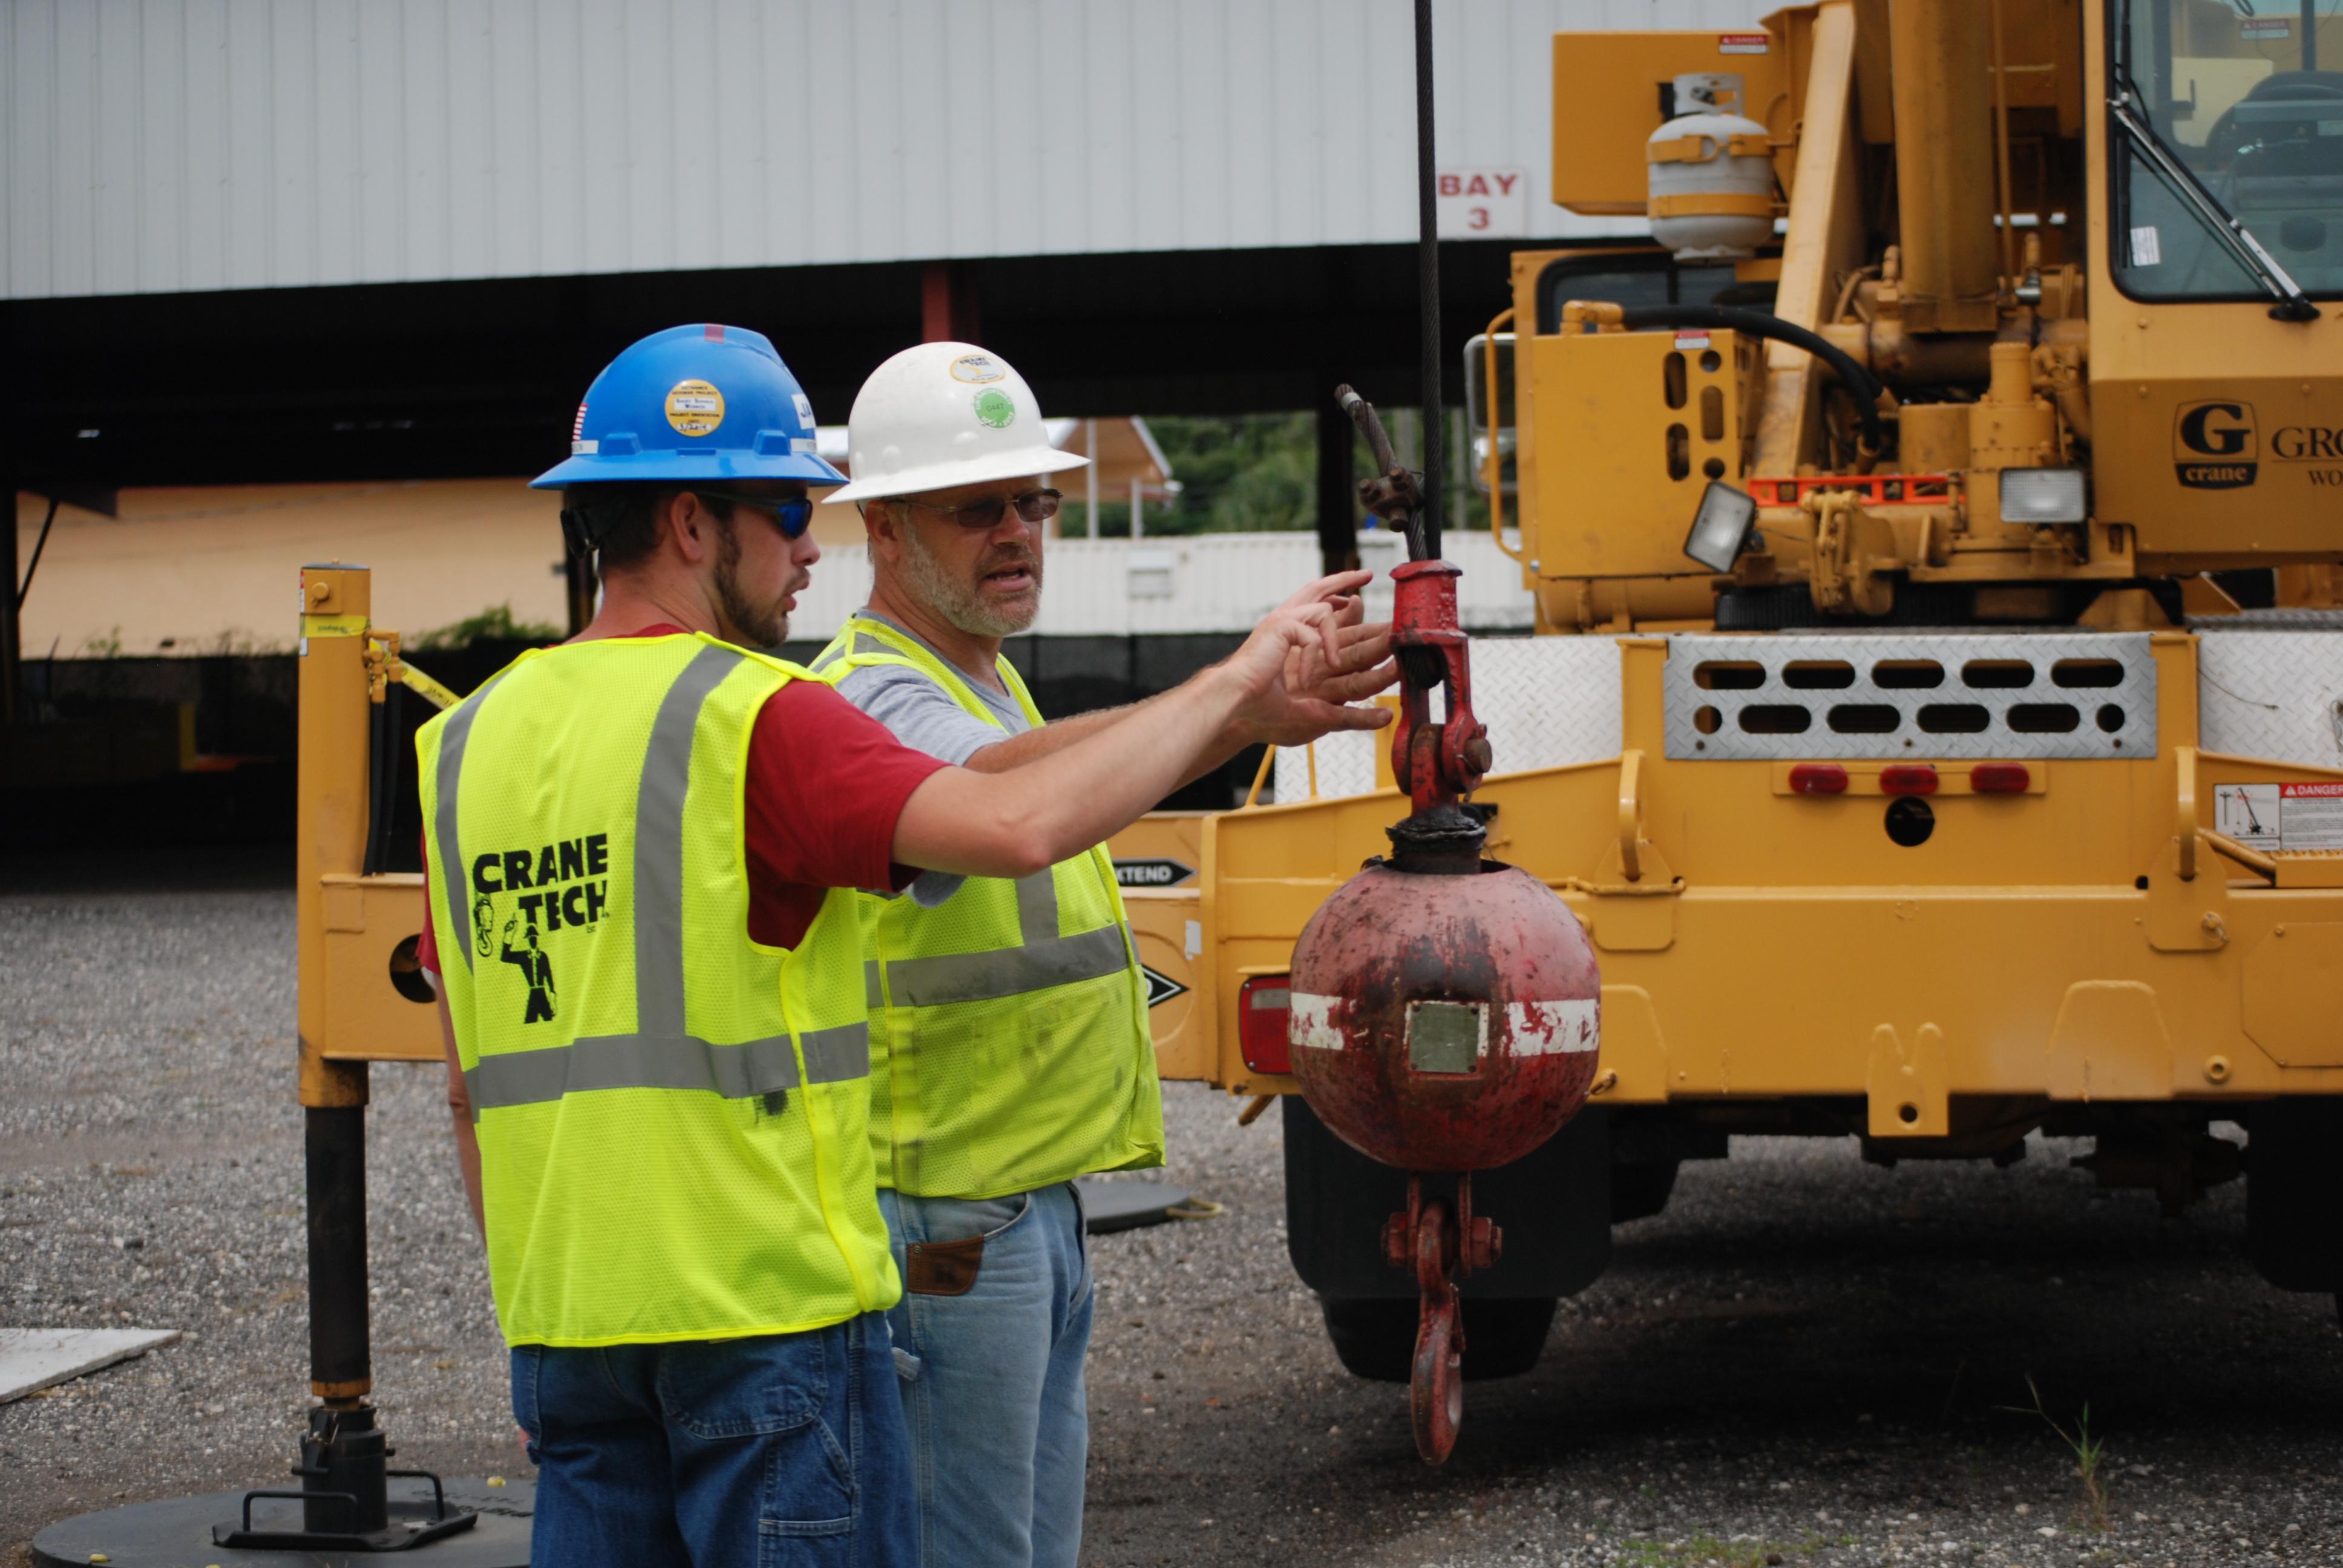 3 Week Professional Crane Operator Program - Crane Tech